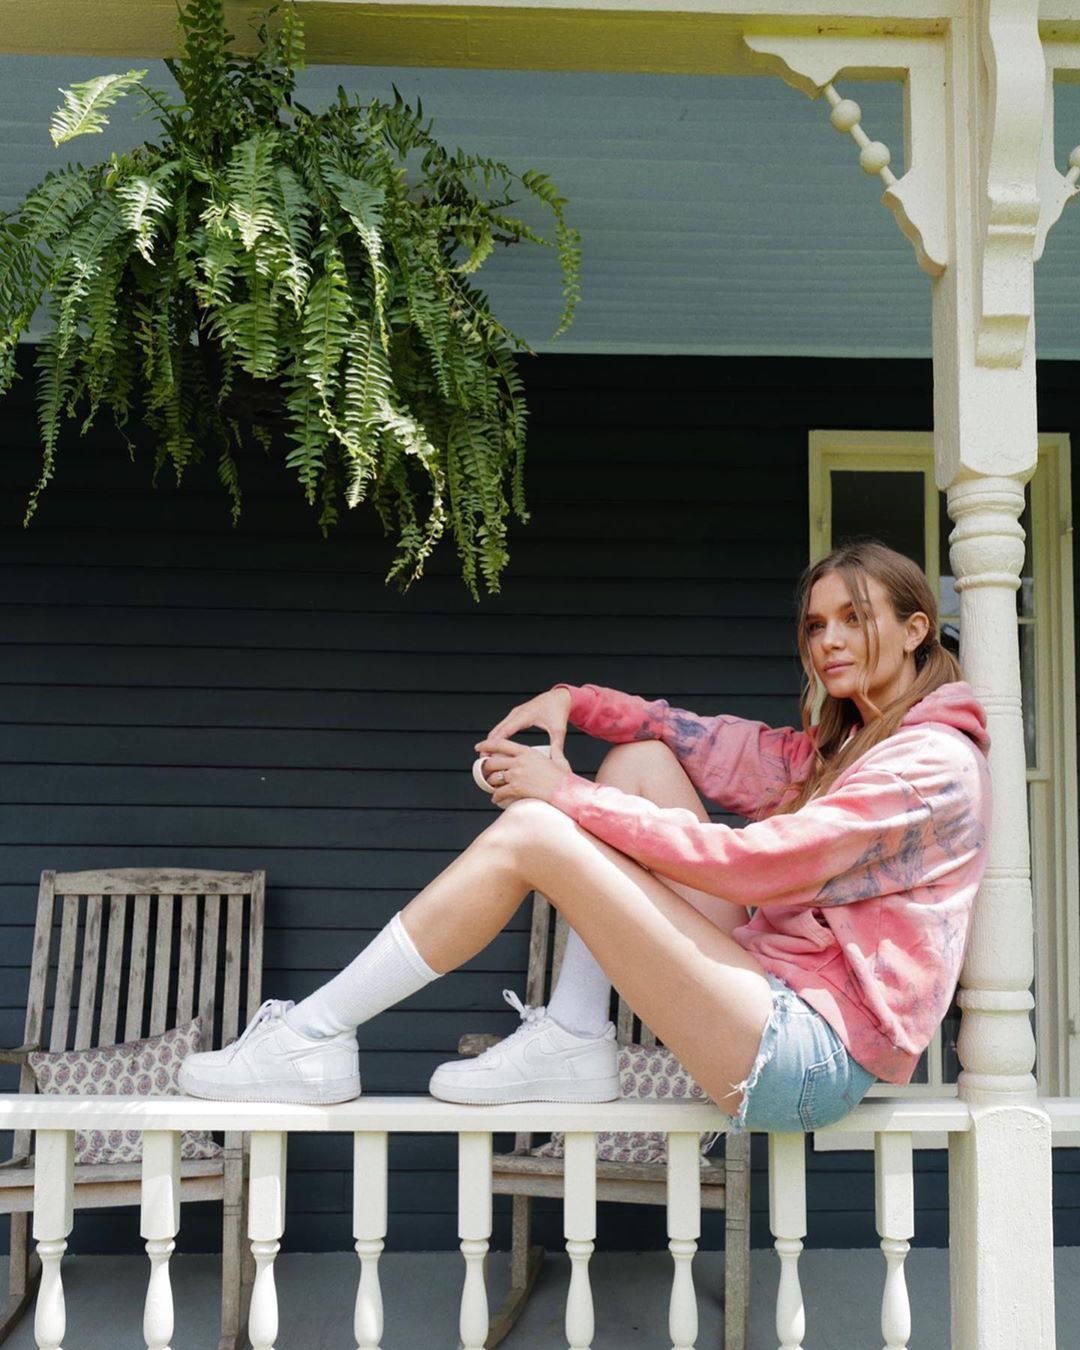 Josephine Skriver Sexy Legs In Denim Shorts